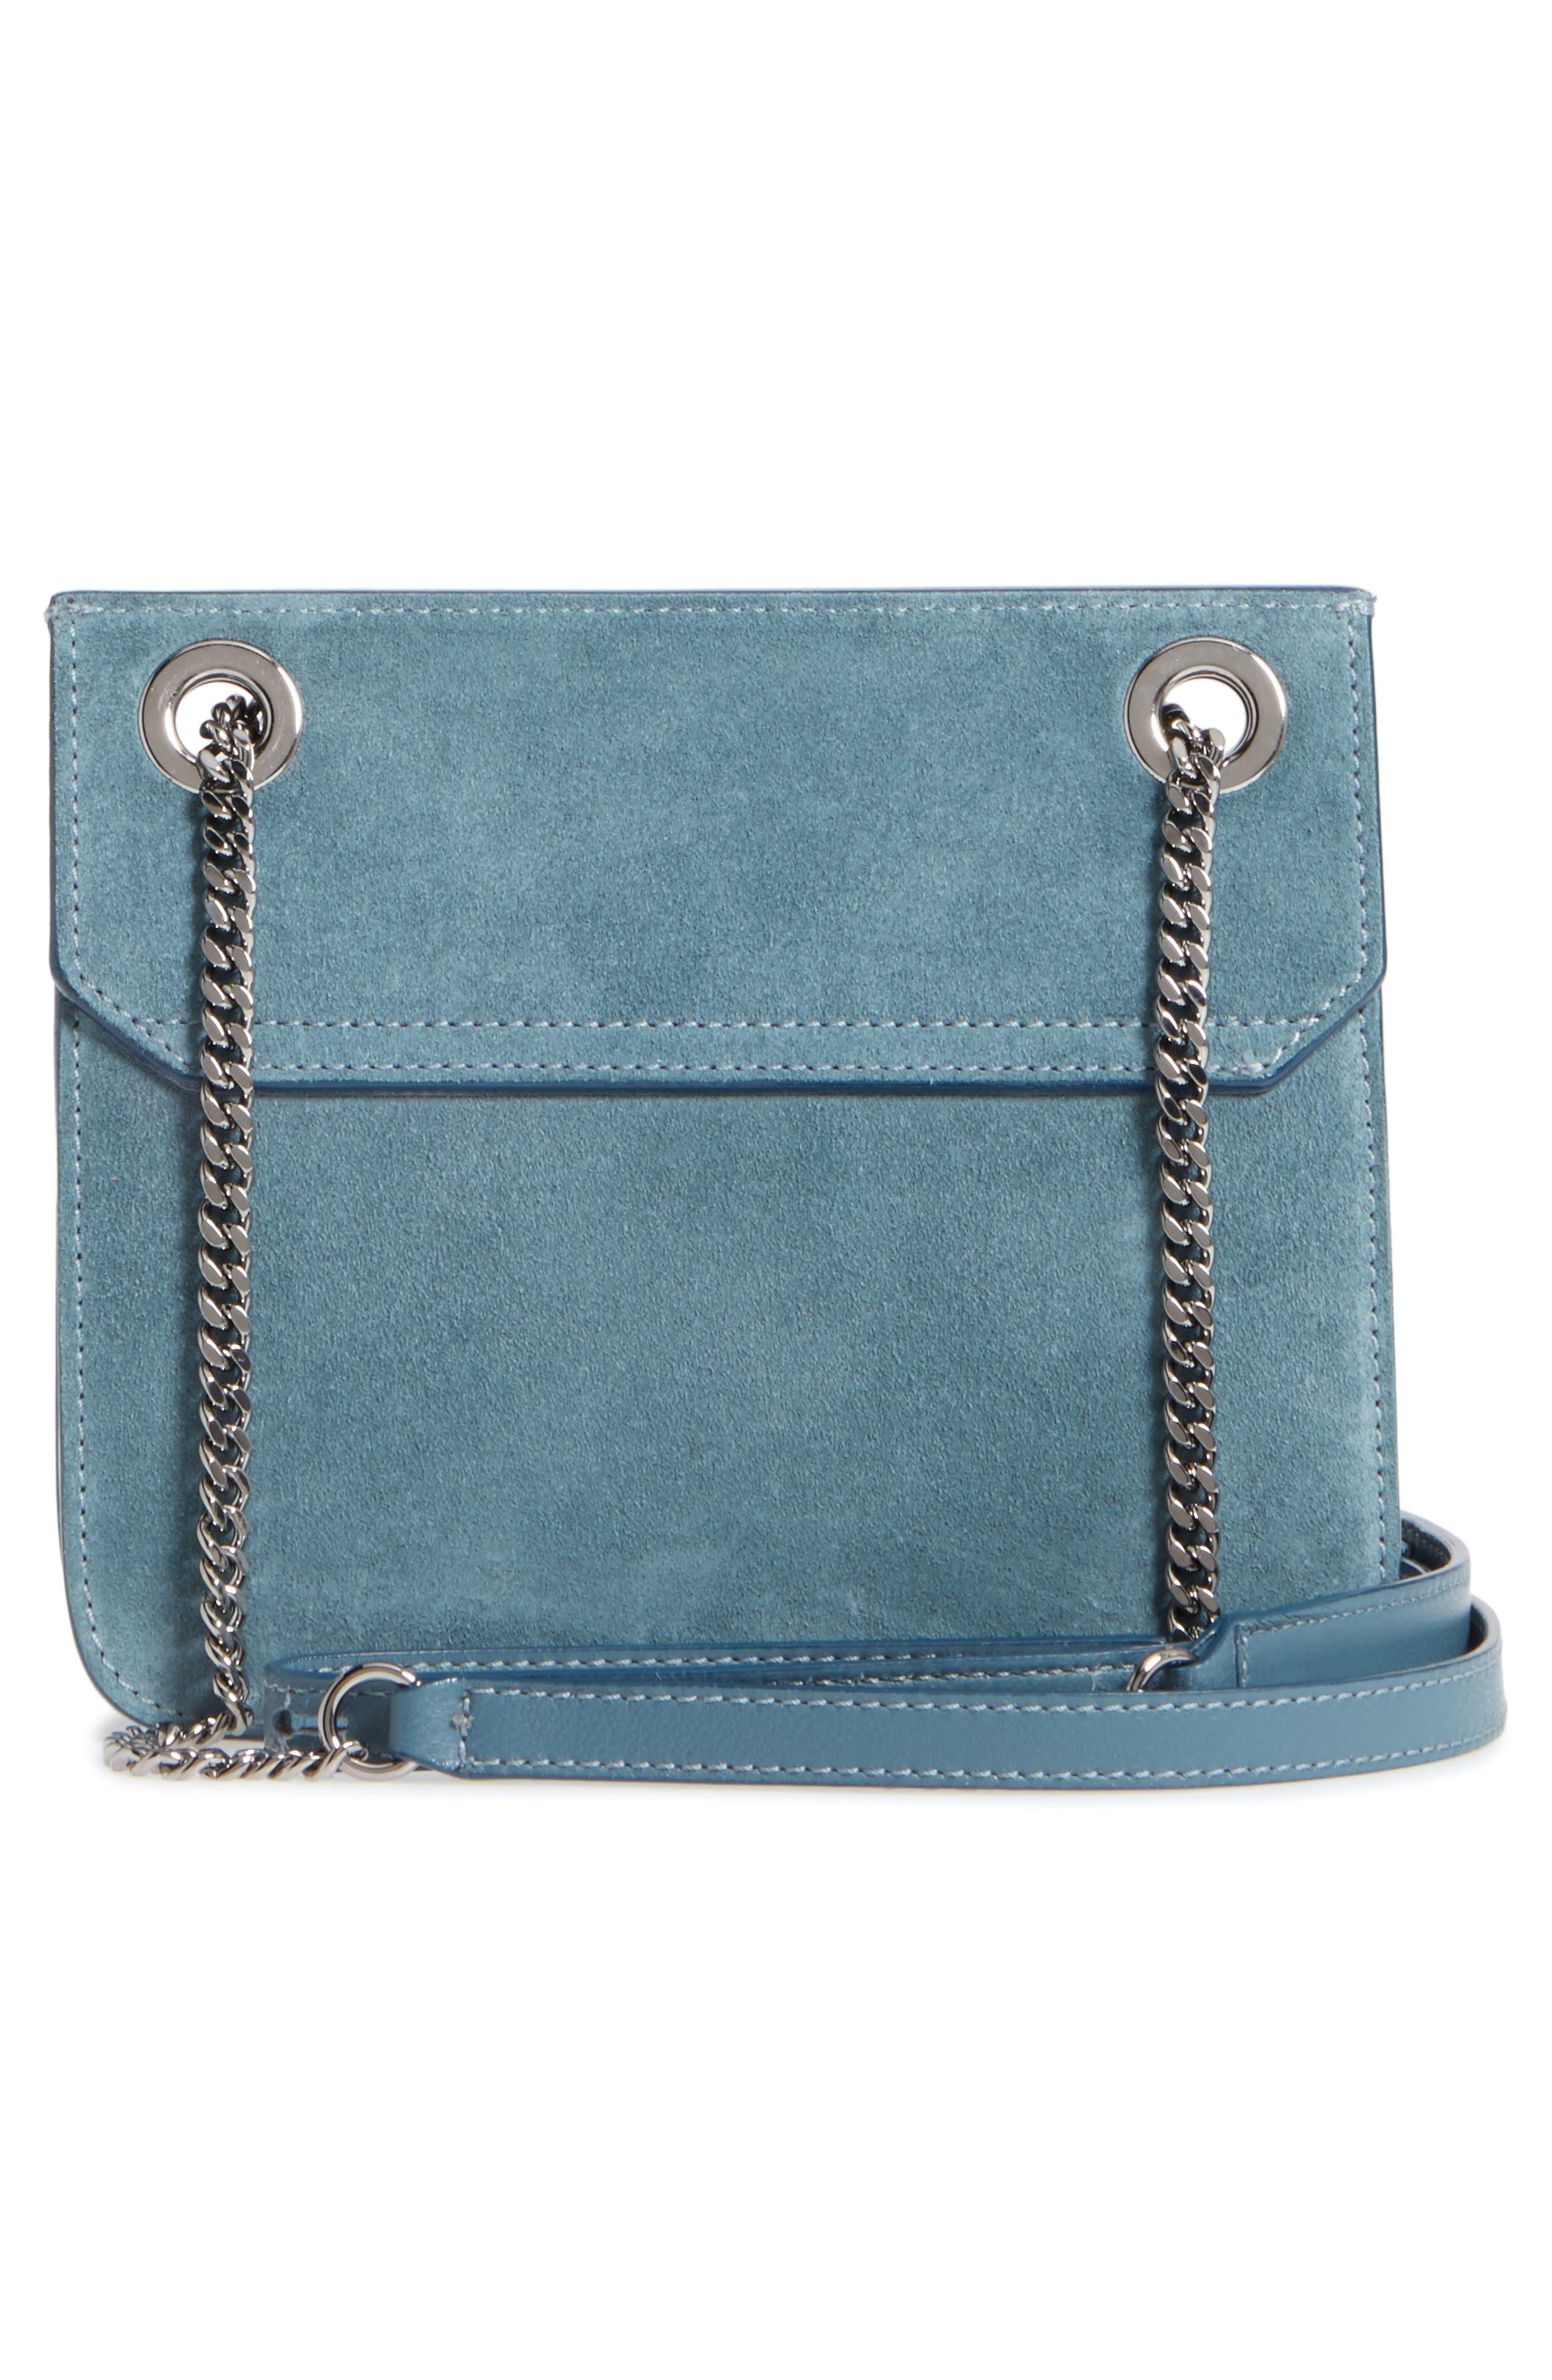 Rebel Suede Crossbody Bag,                             Alternate thumbnail 3, color,                             Dusk Blue